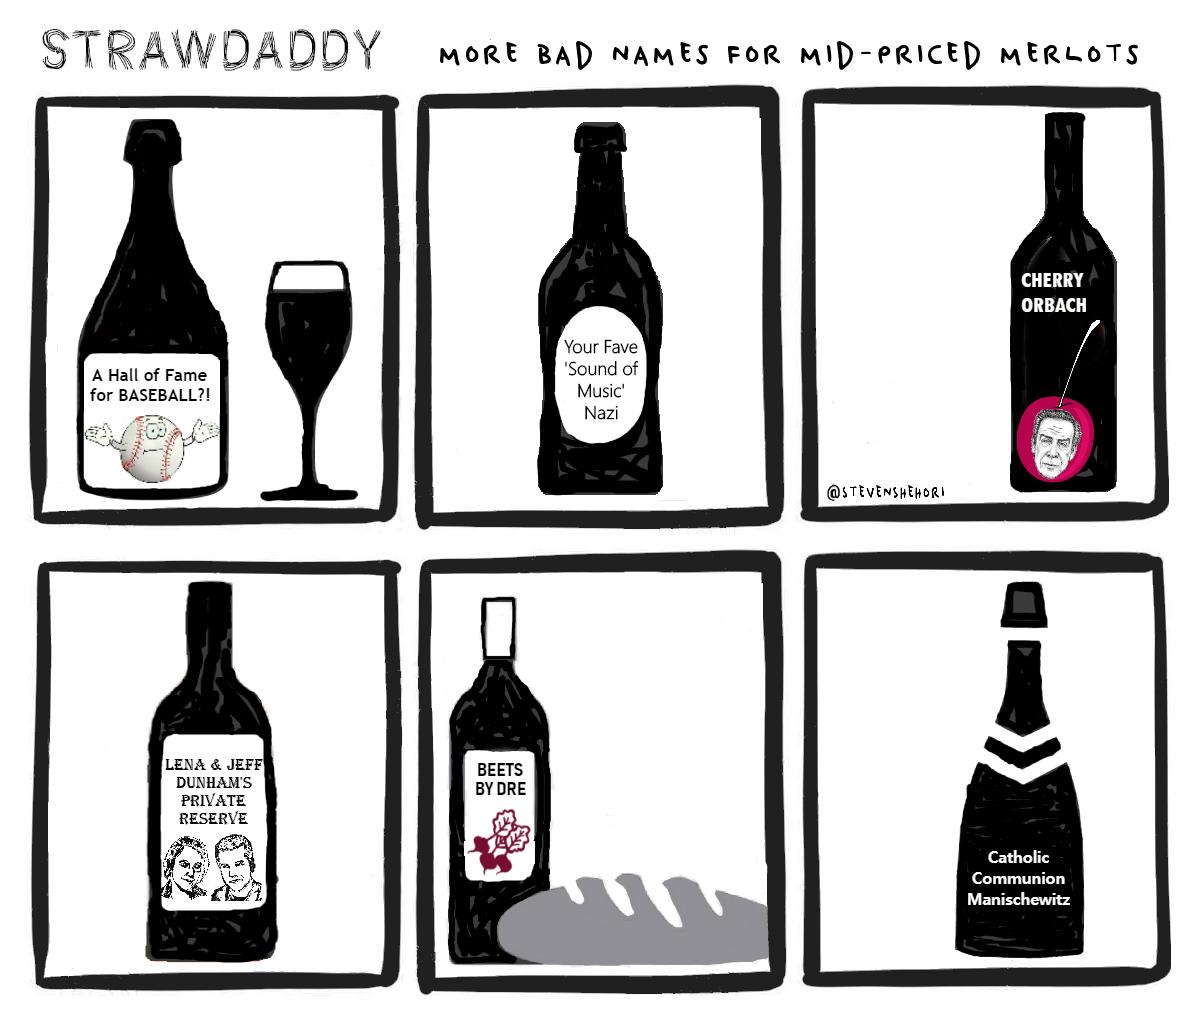 Steven Shehori's Strawdaddy